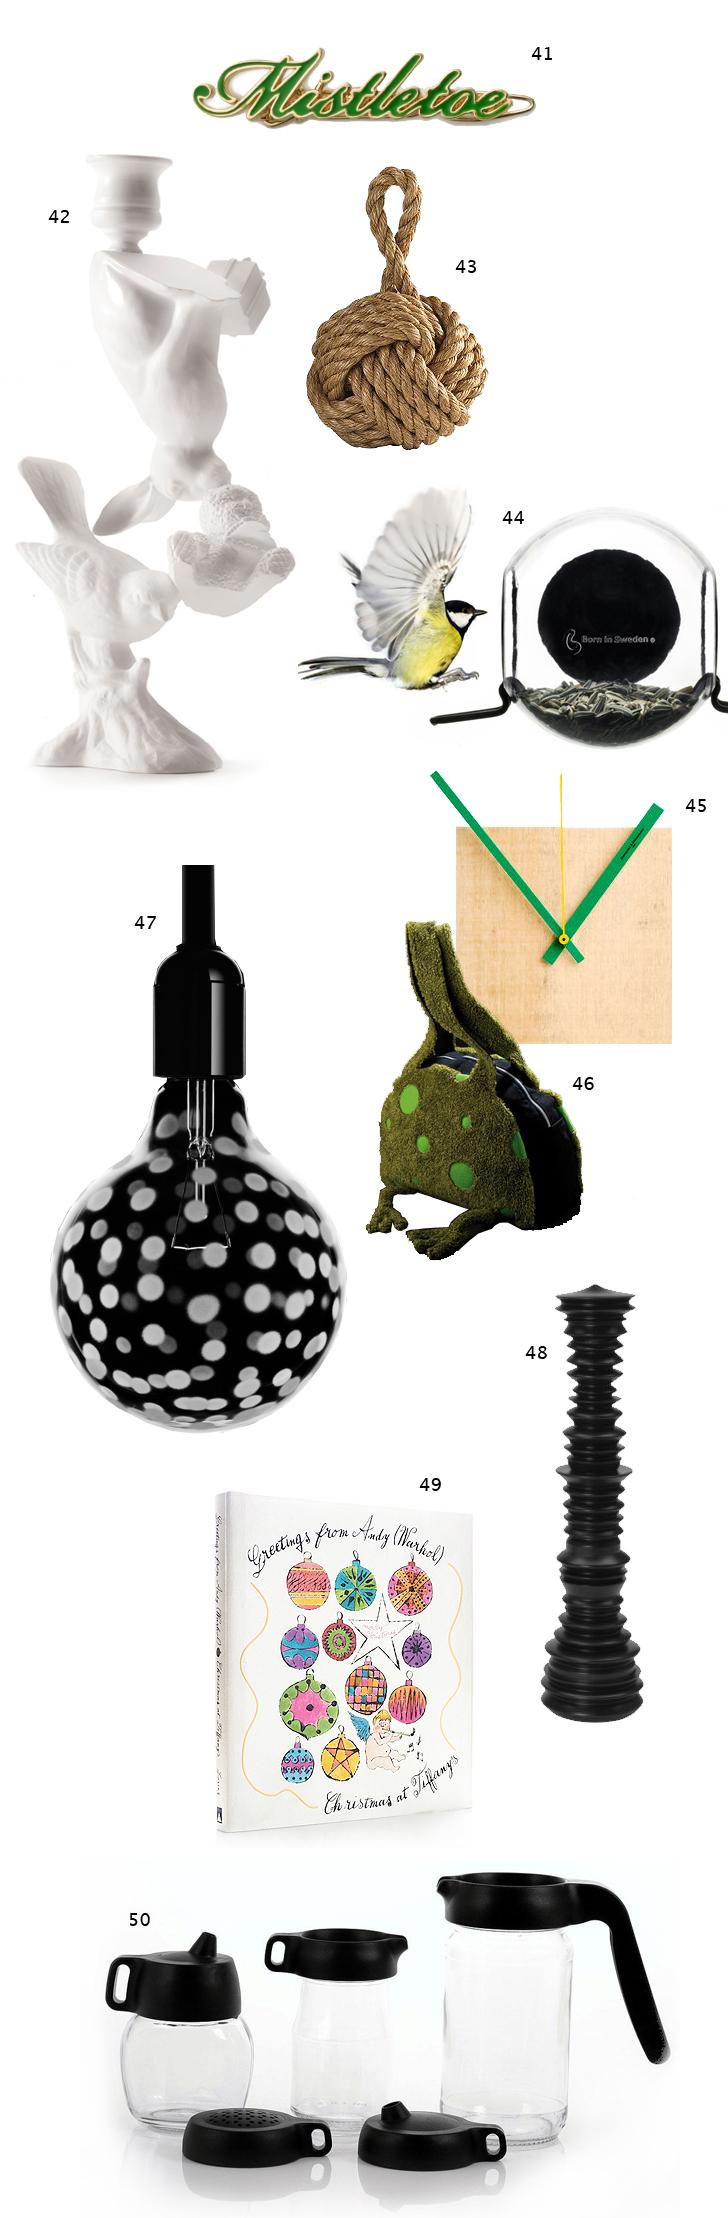 Gift-guide-50-e